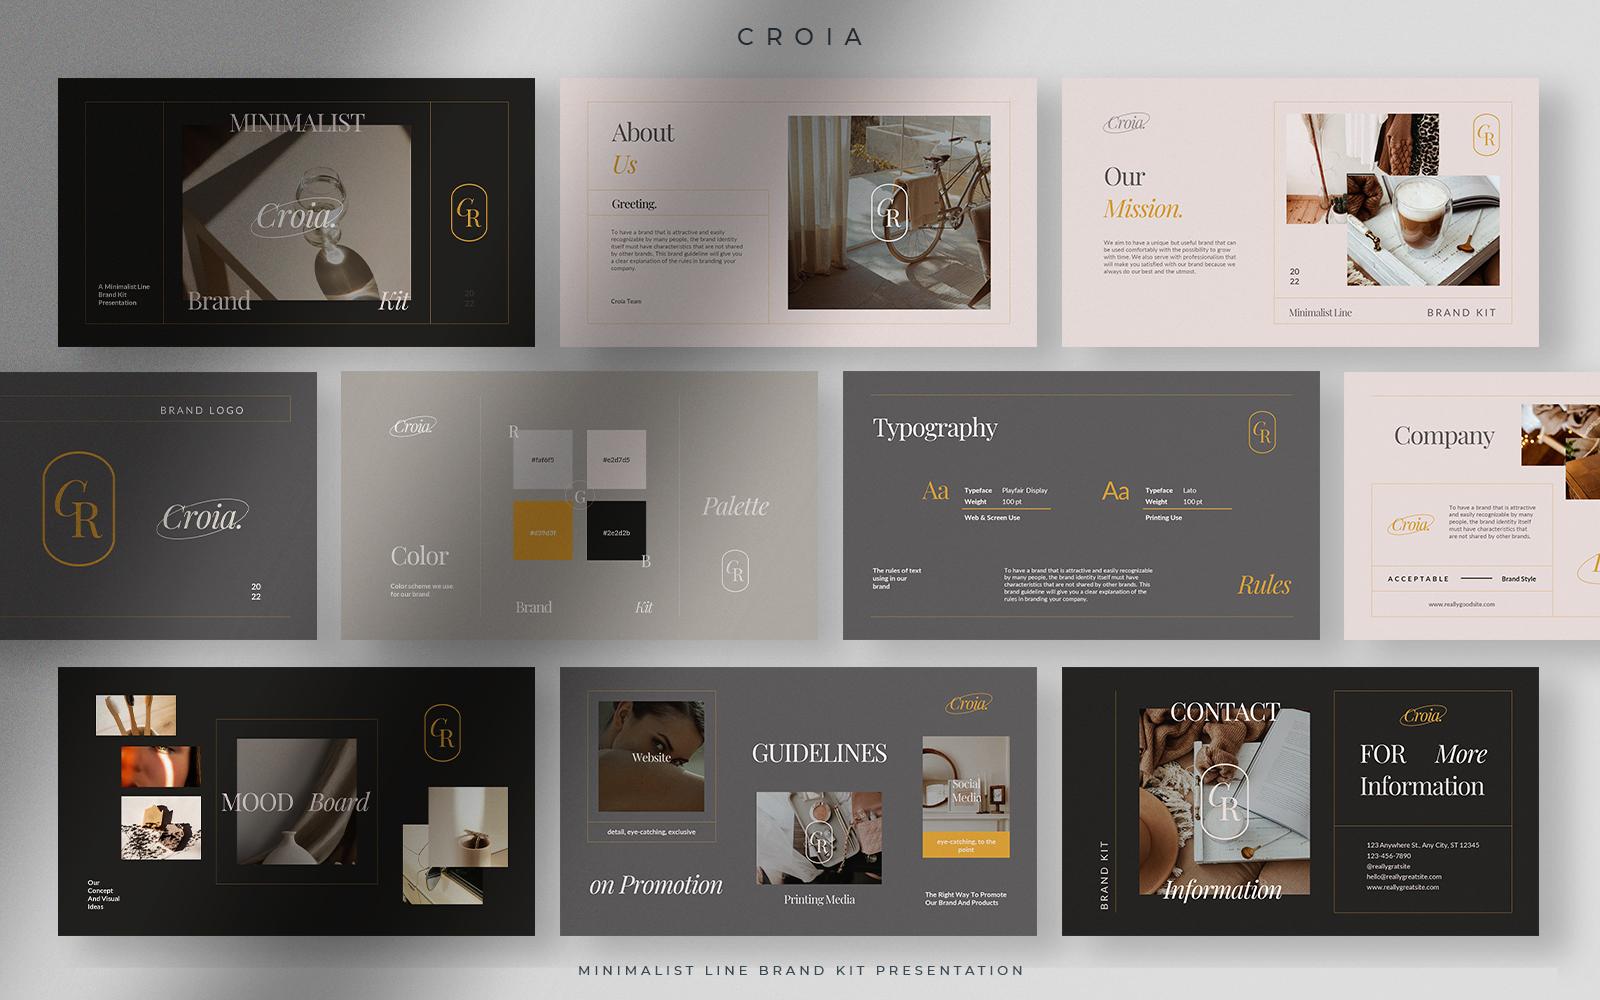 Croía - Gray Sand Minimalist Line Brand Kit Presentation